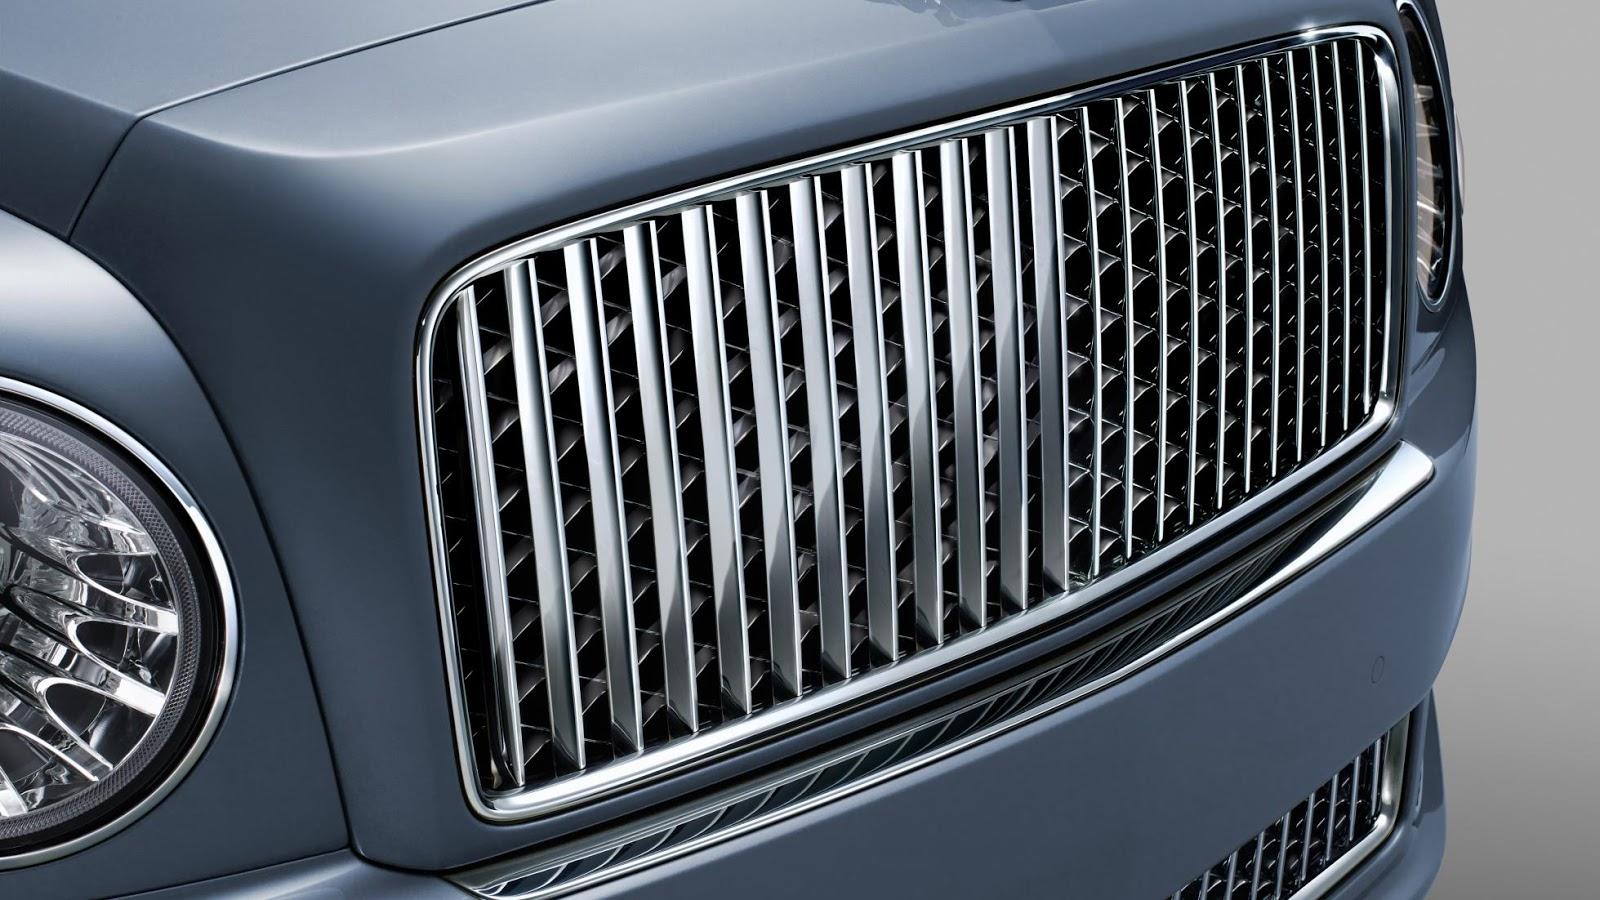 Đánh giá Bentley Mulsanne 2017